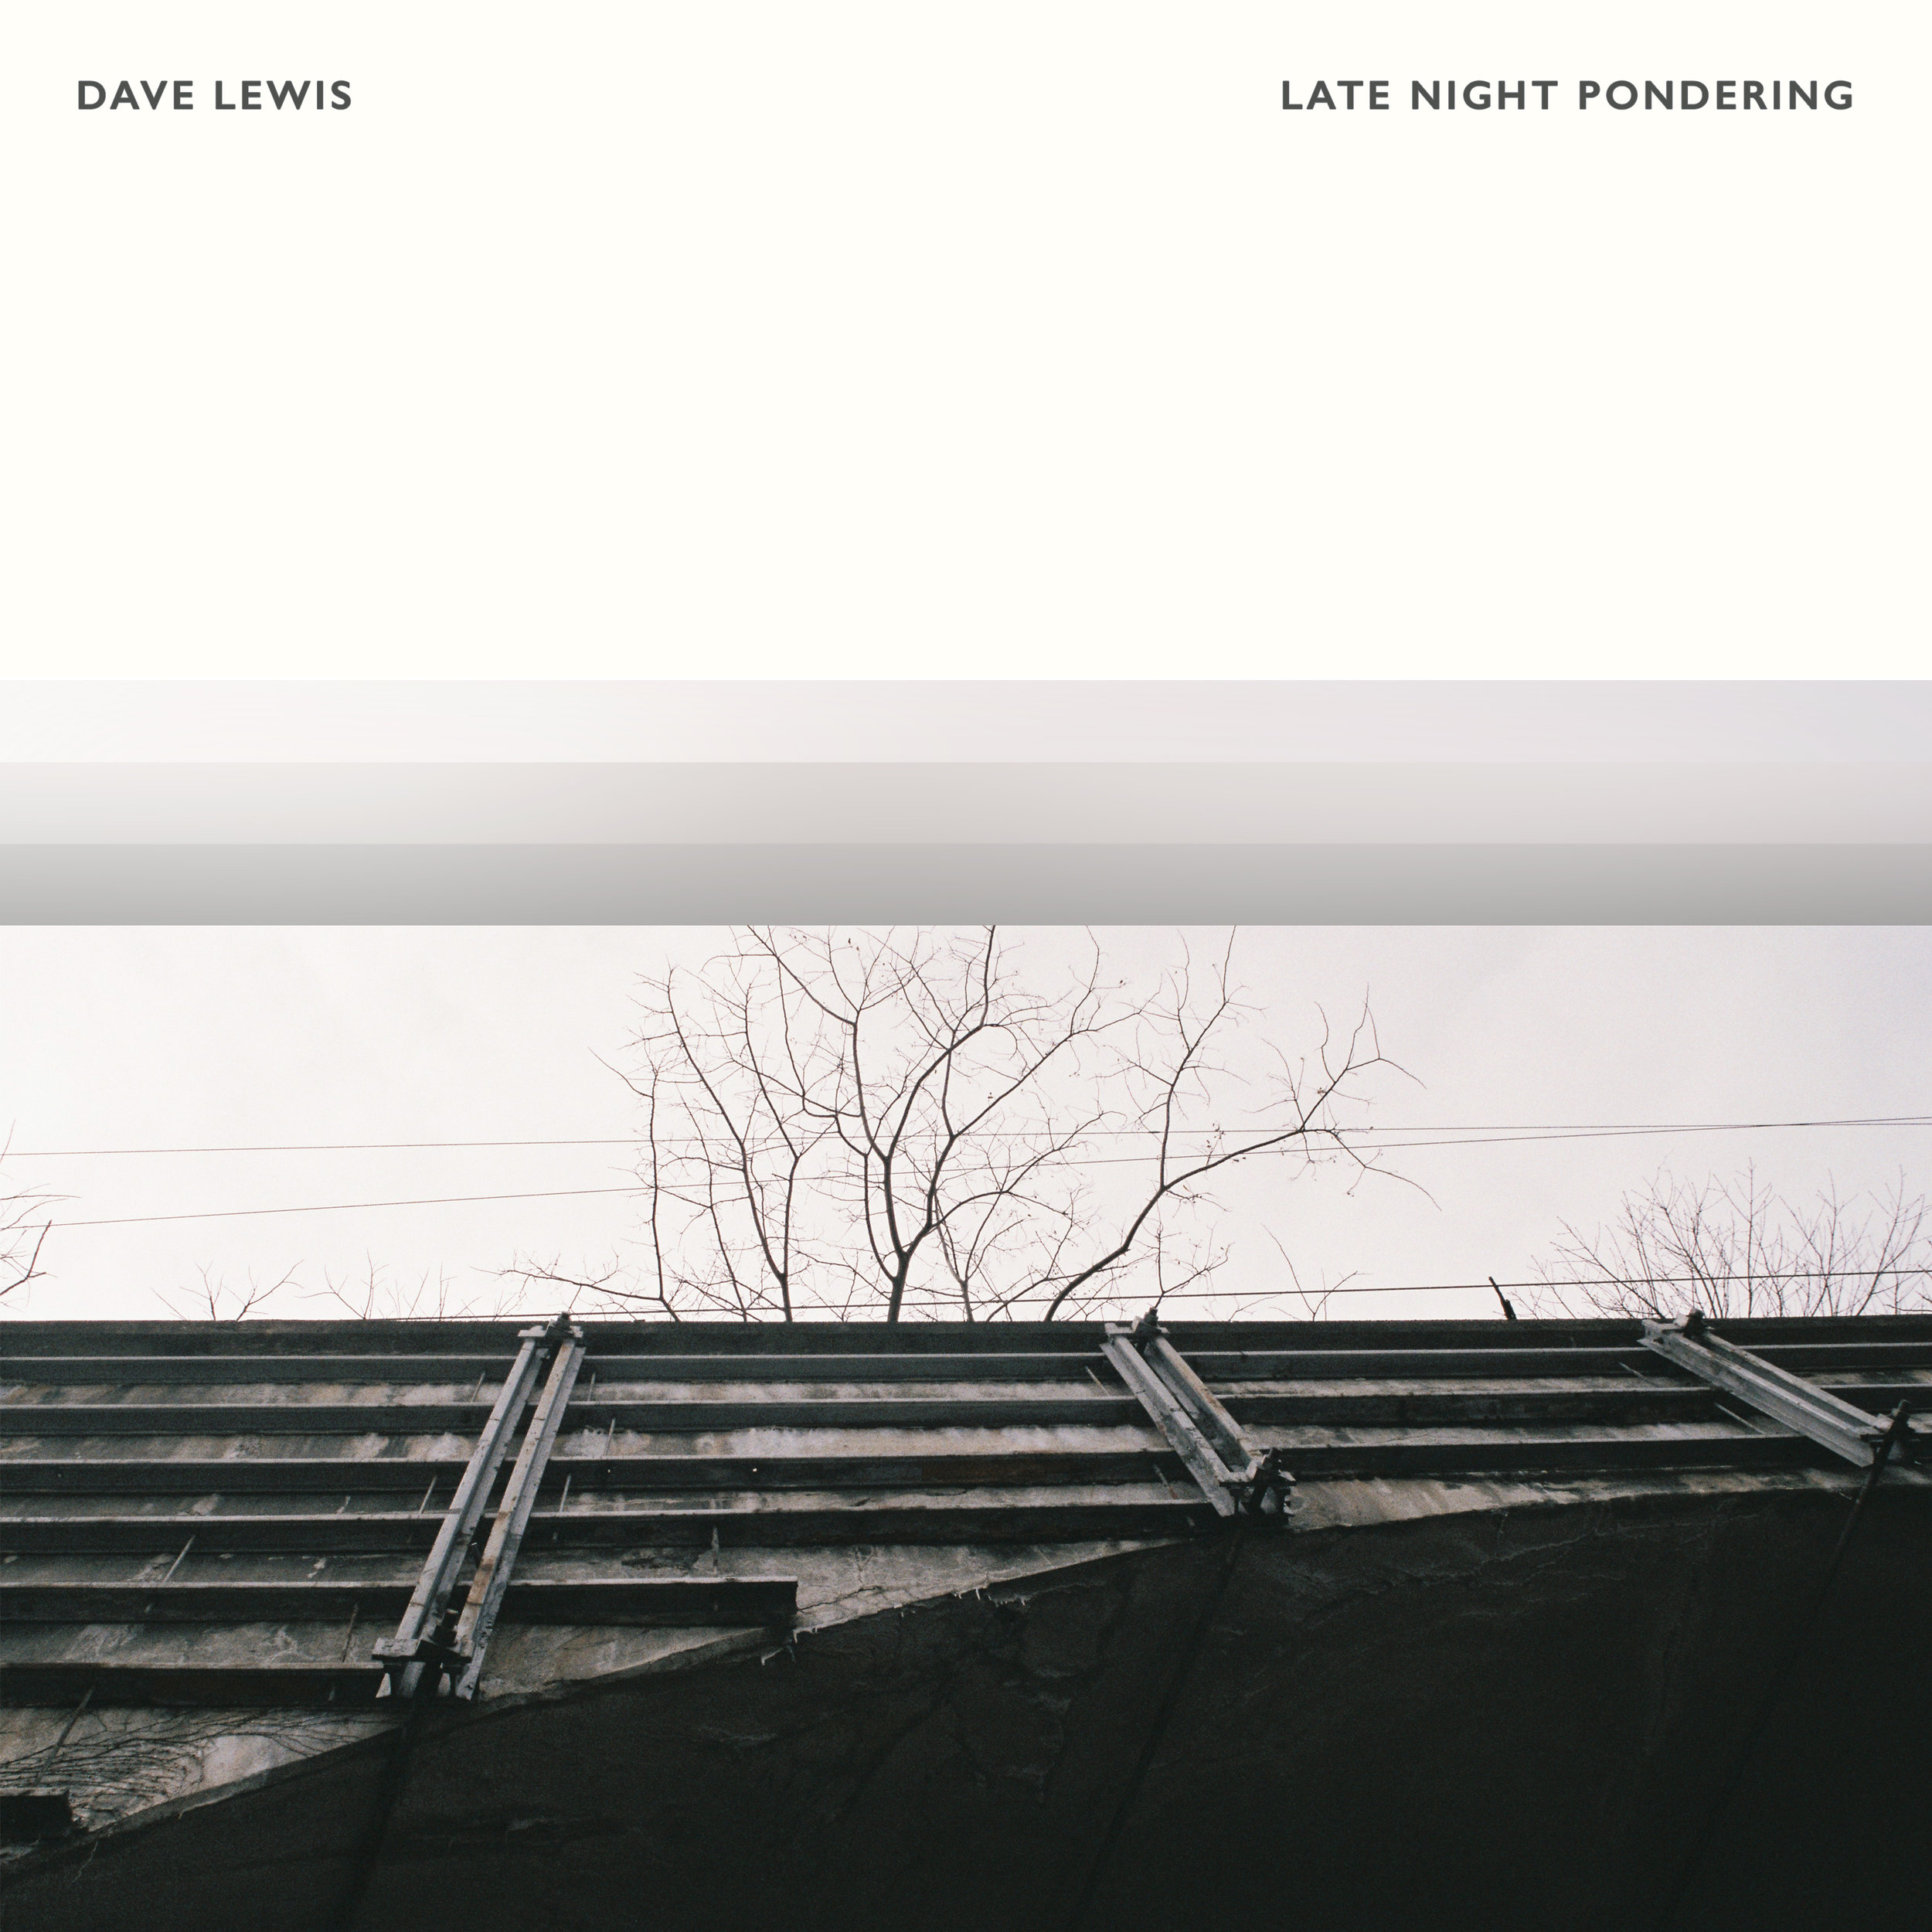 Dave Lewis - Late Night Pondering